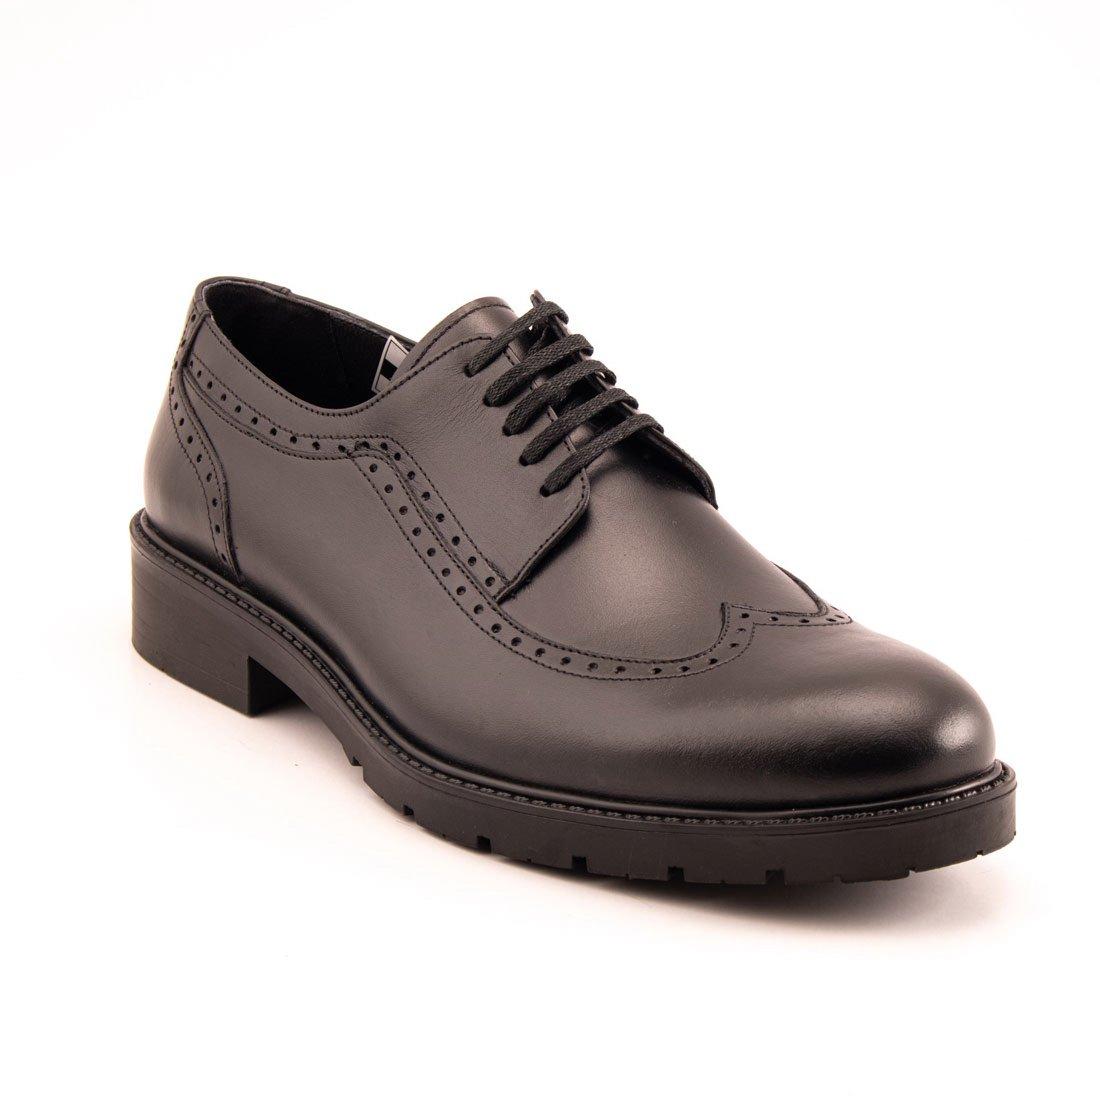 مردانه کفش پاندا کد10440هشترک بندی